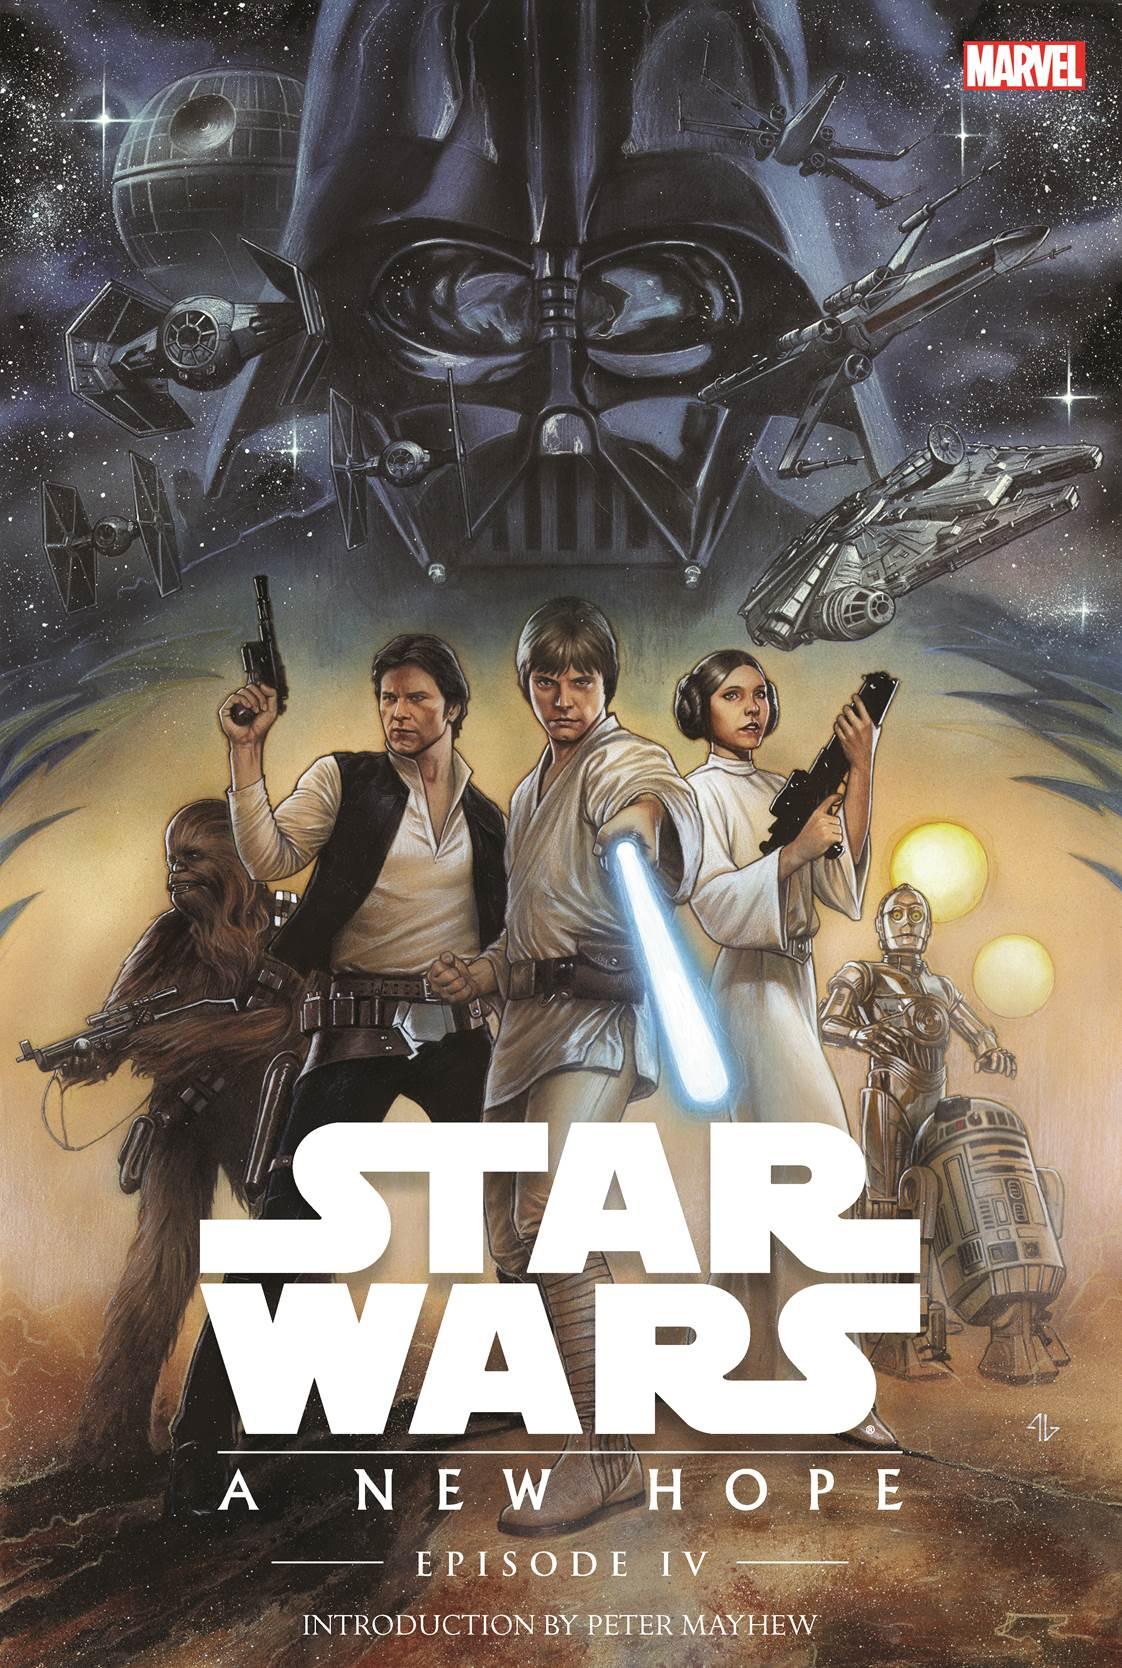 Star Wars Episode IV: A New Hope (Marvel Remastered Edition)